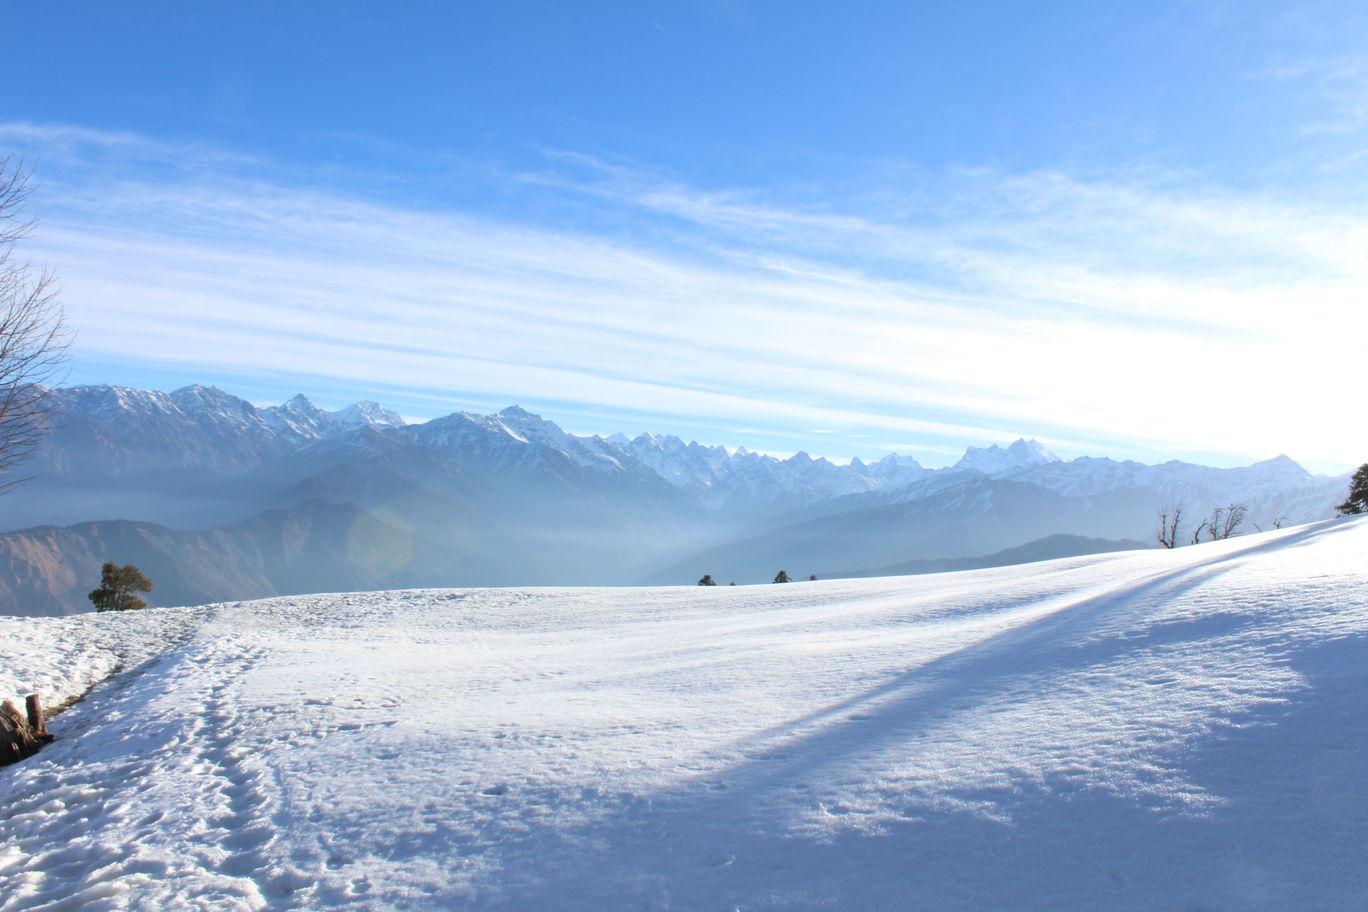 Photo of Kedarkantha Peak By Ranjani Surashastry